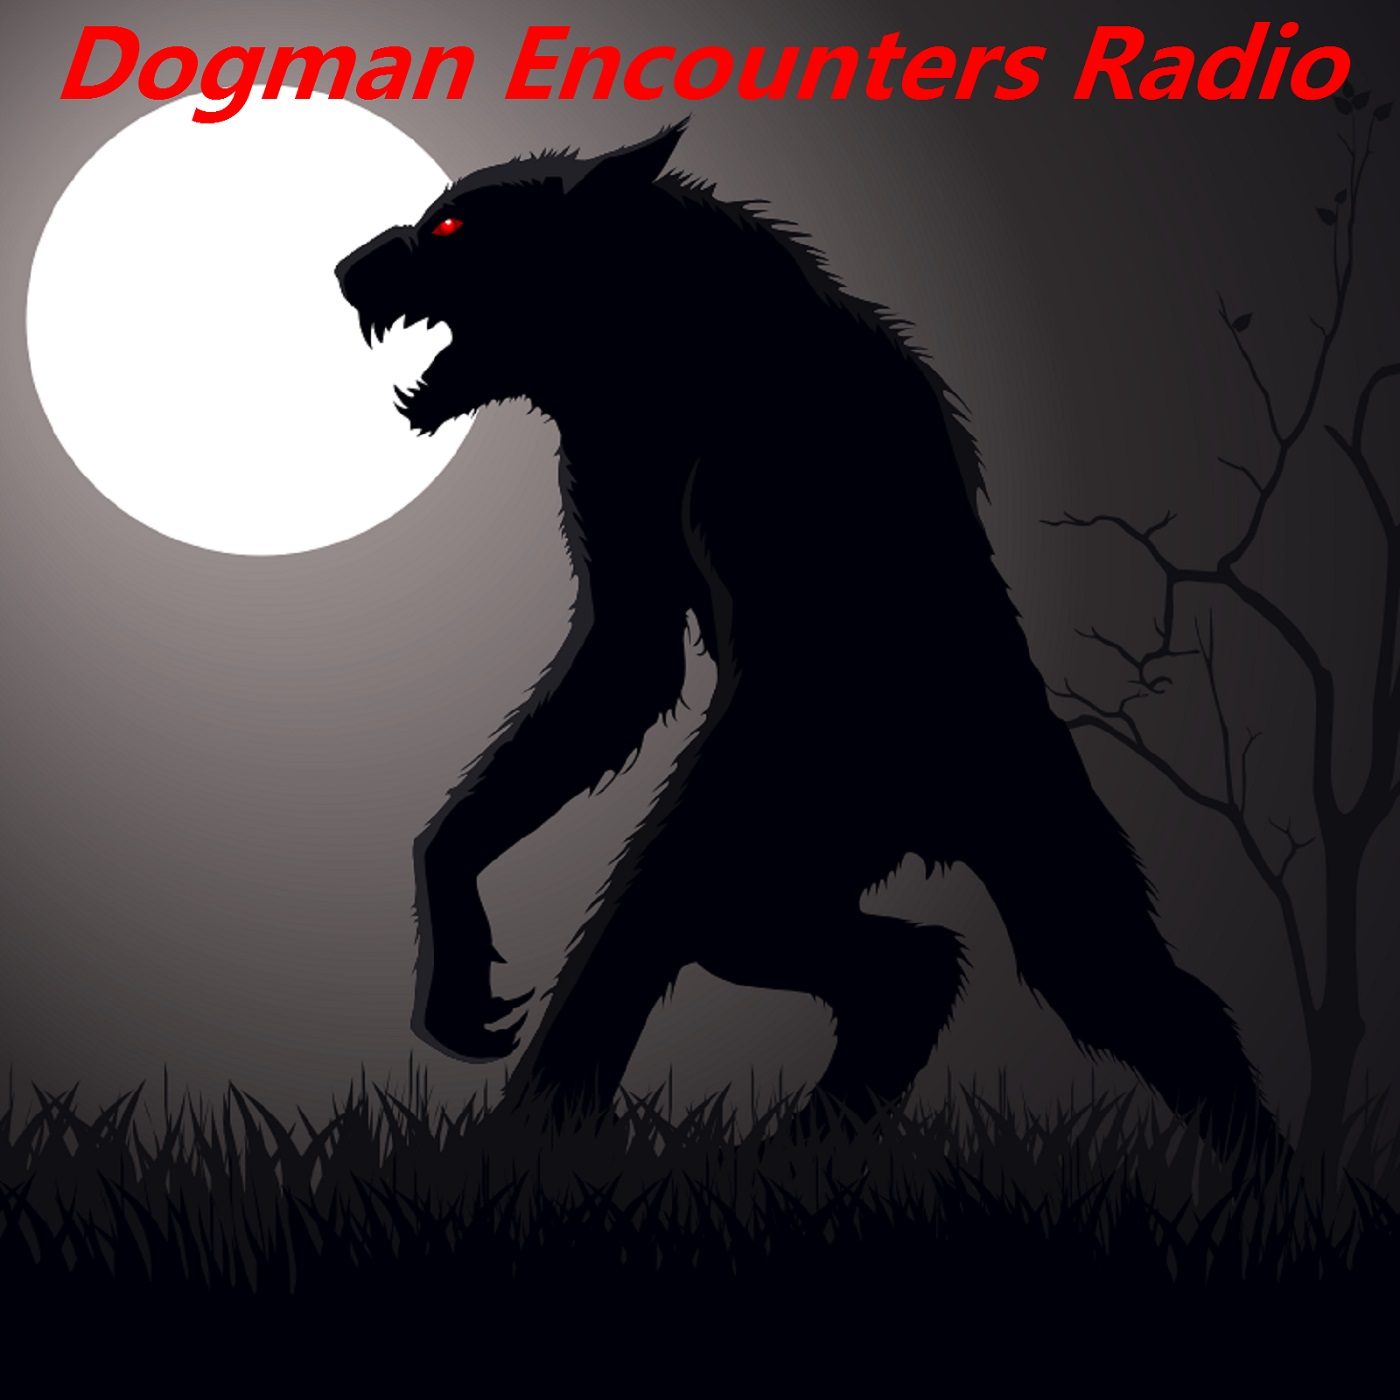 Artwork for Dogman Encounters Episode 5